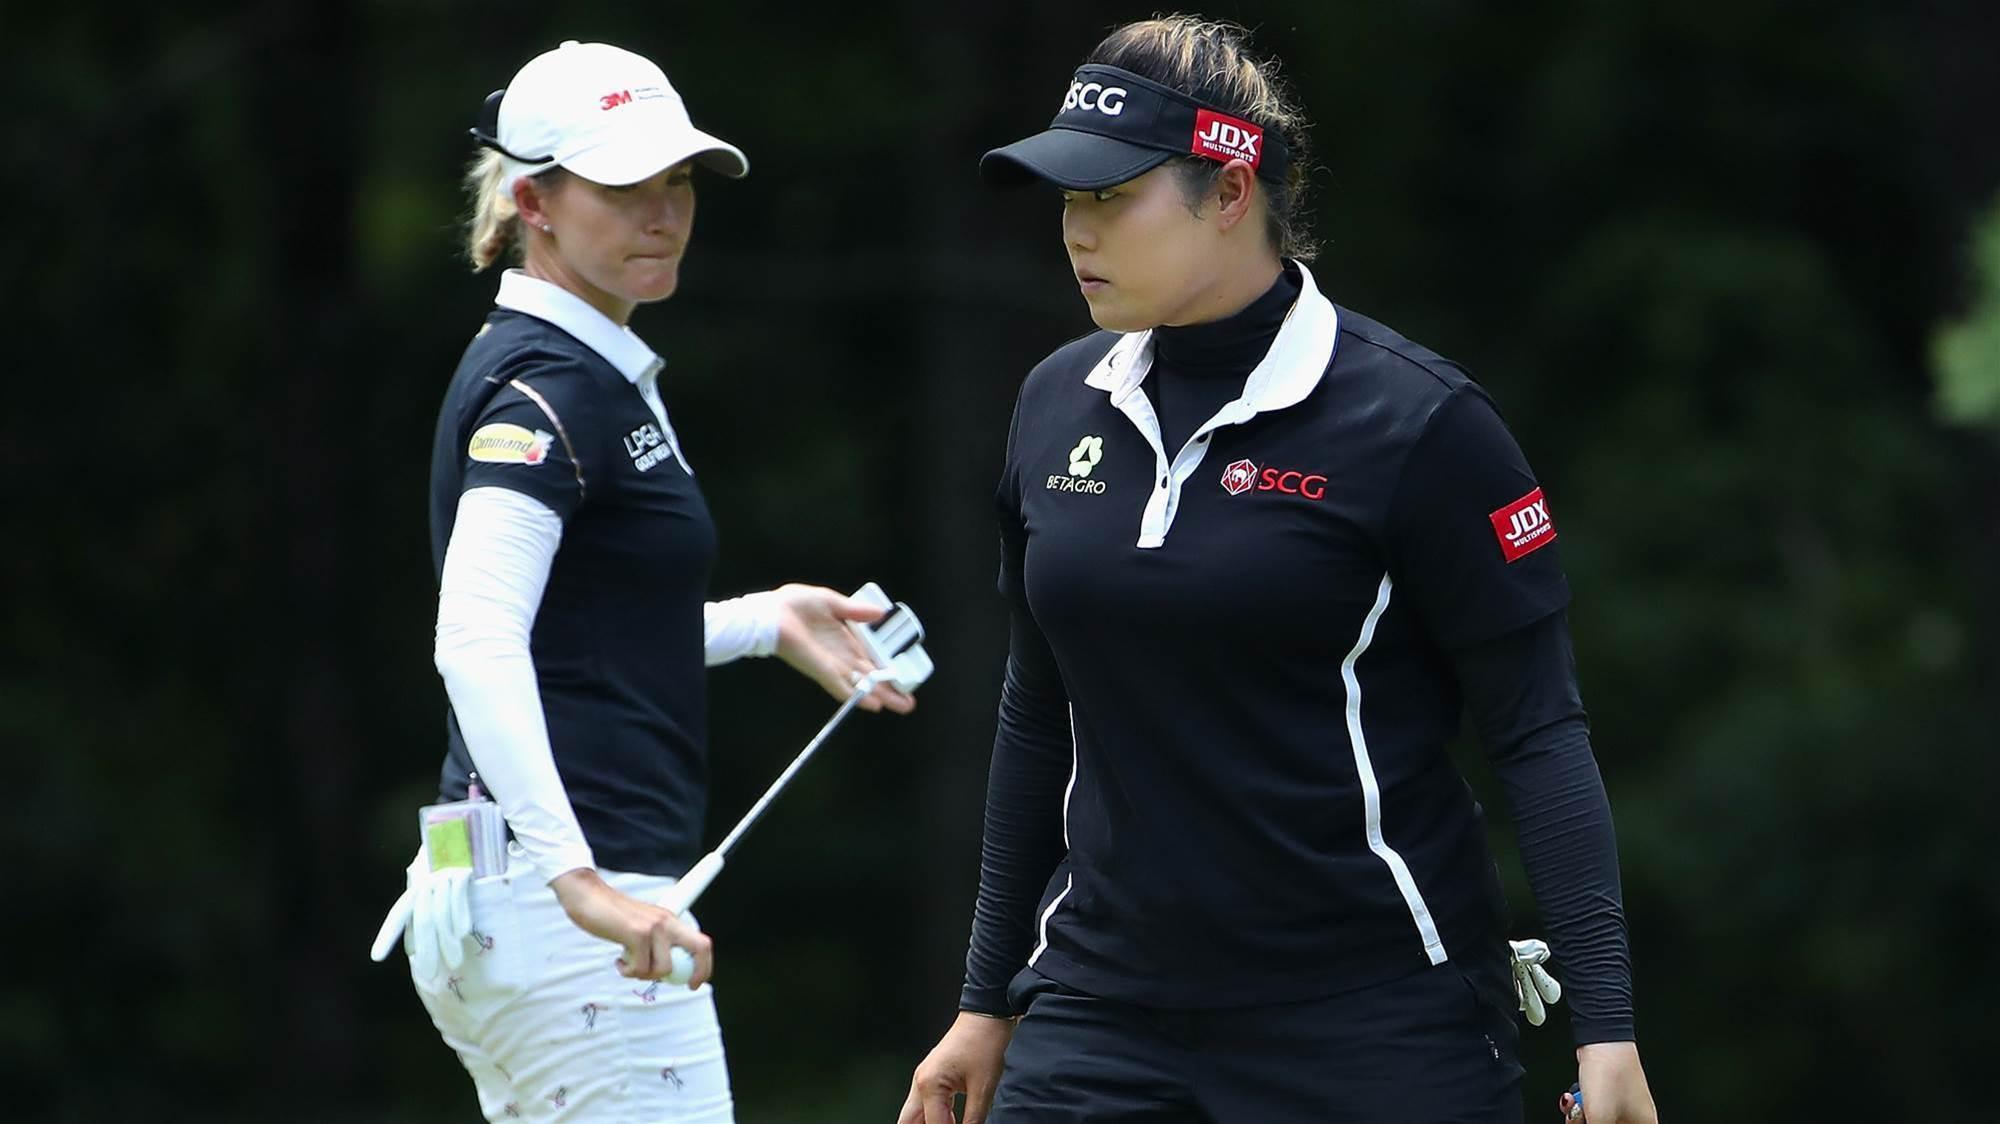 Smith fades as Jutanugarn wins US Women's Open